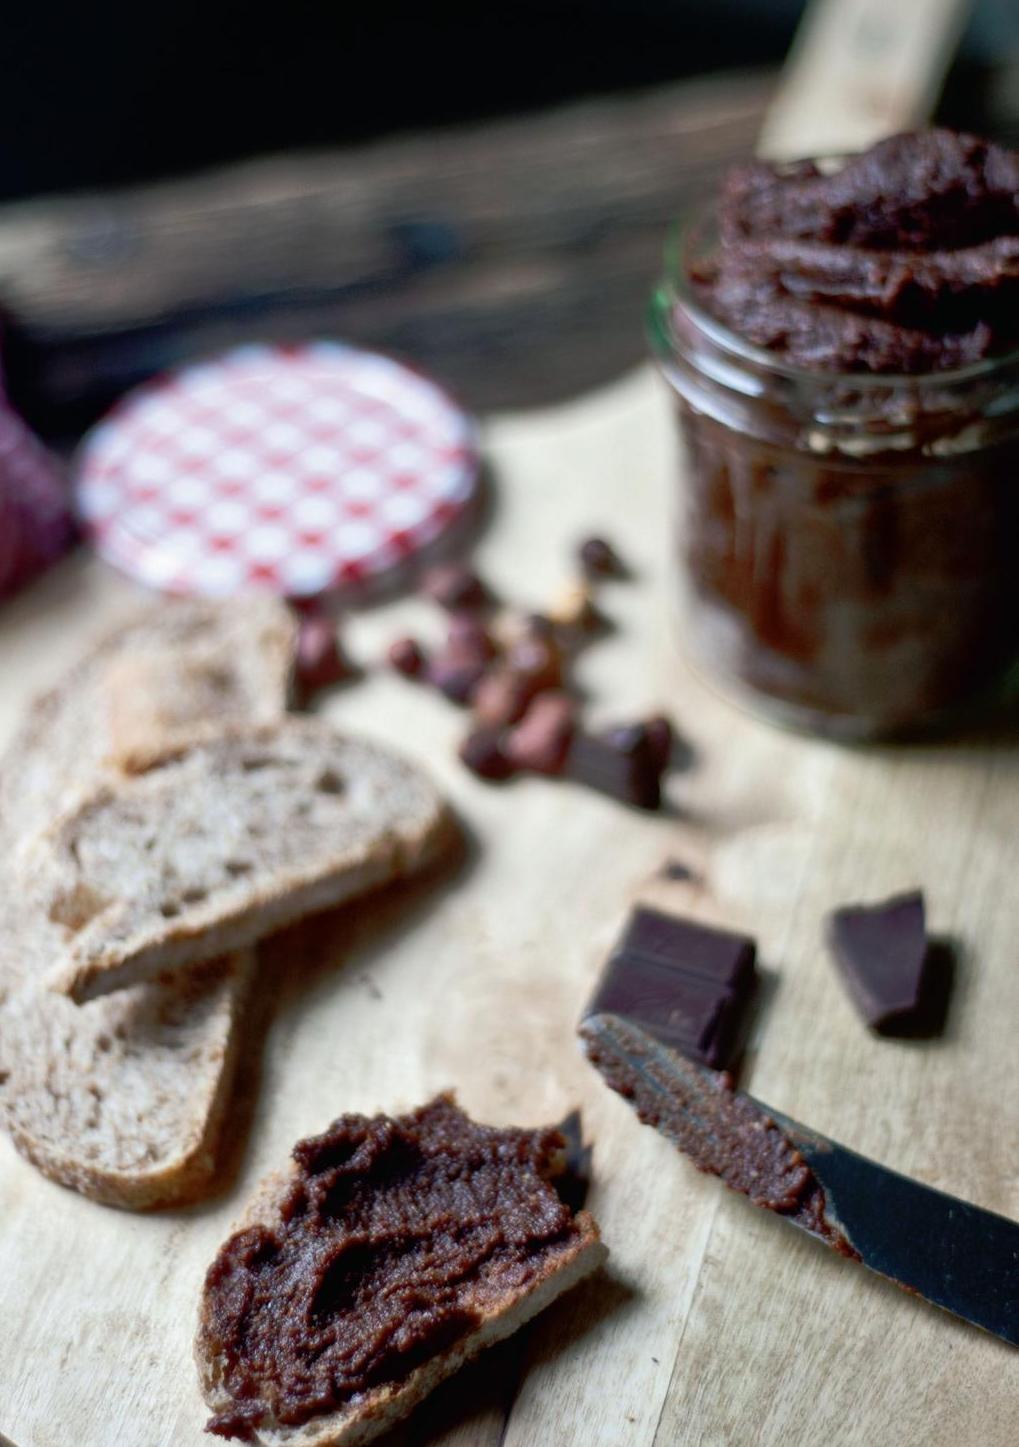 f-ellen-marie-forget-nutella-17.jpg